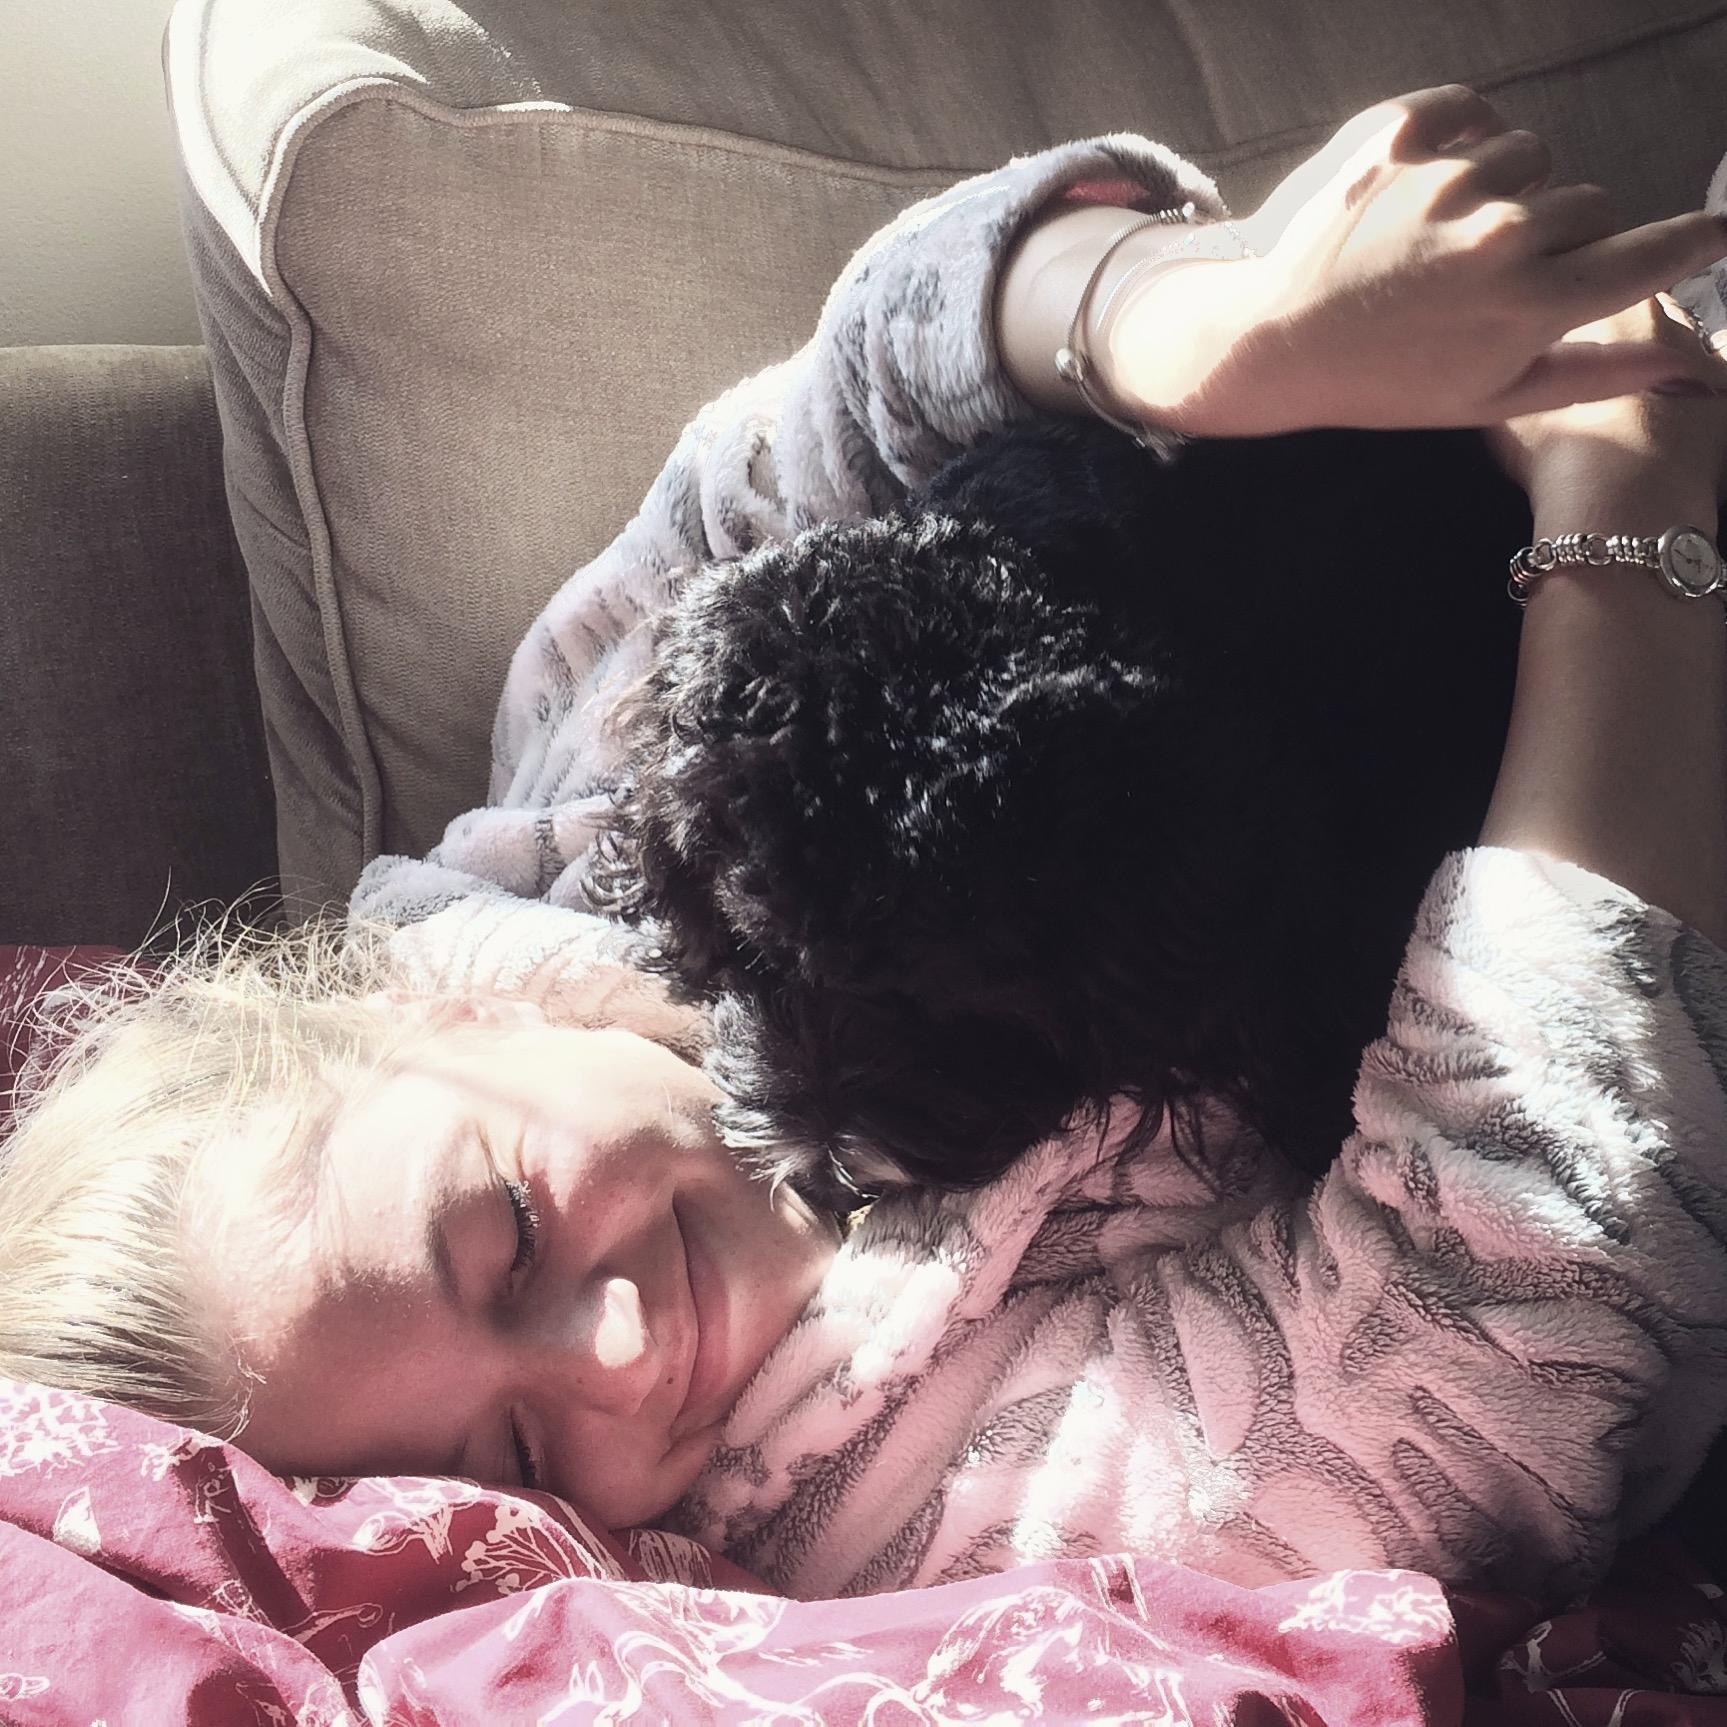 Family - Bella and Jordan, makes my heart smile.